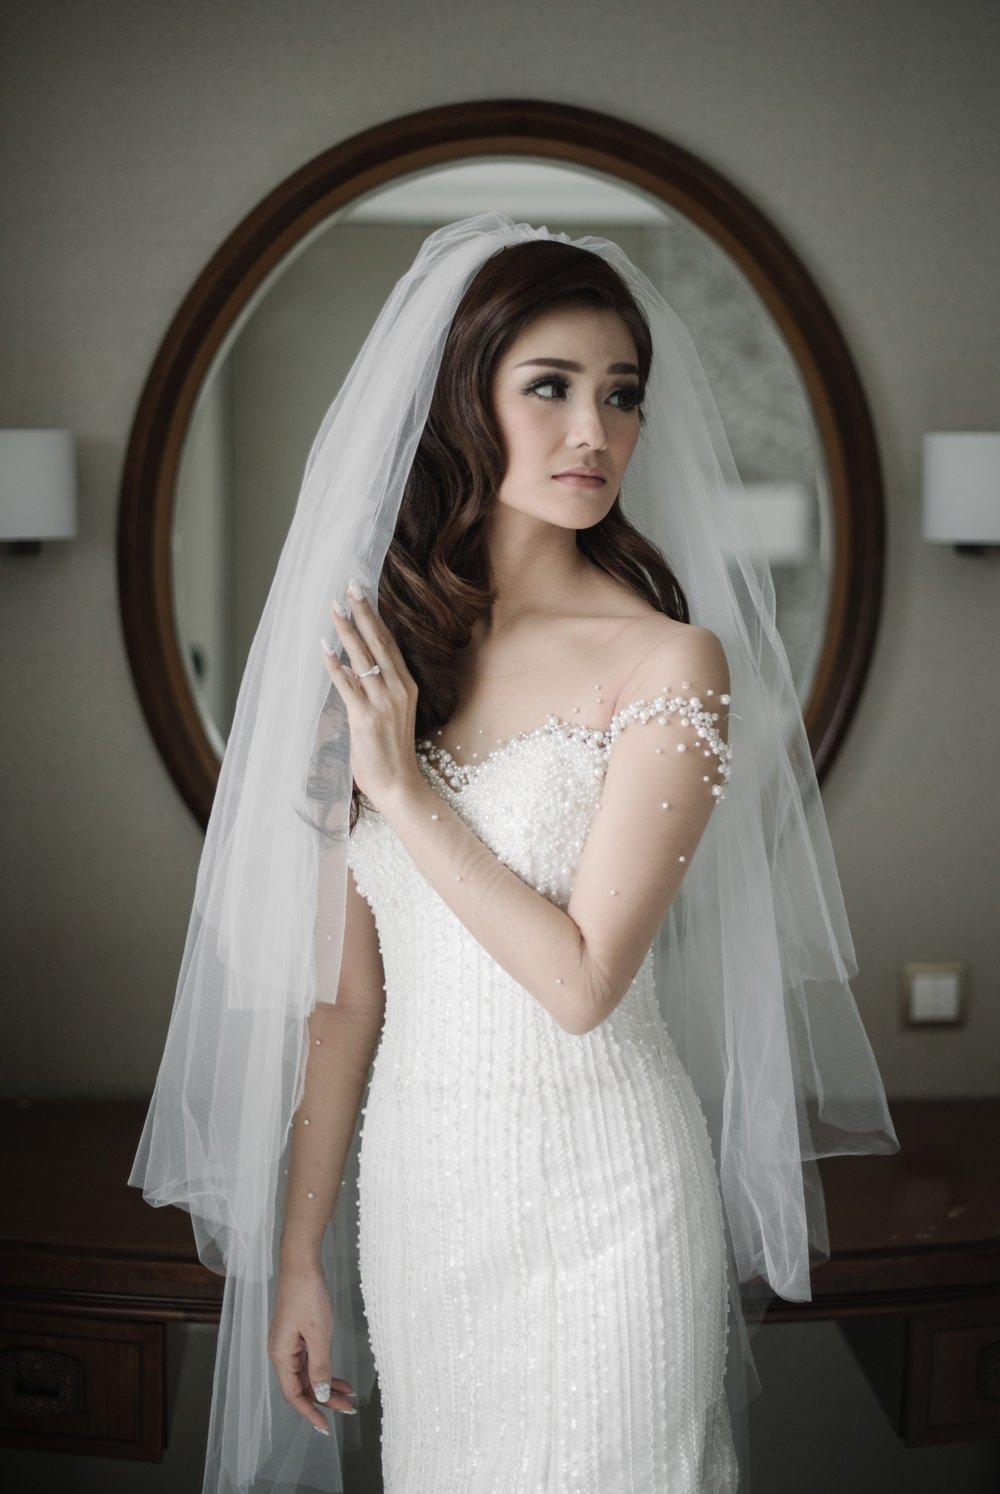 livia-reagan-wedding-raffles-jakarta-pyara-photo-gejoo 19.jpg